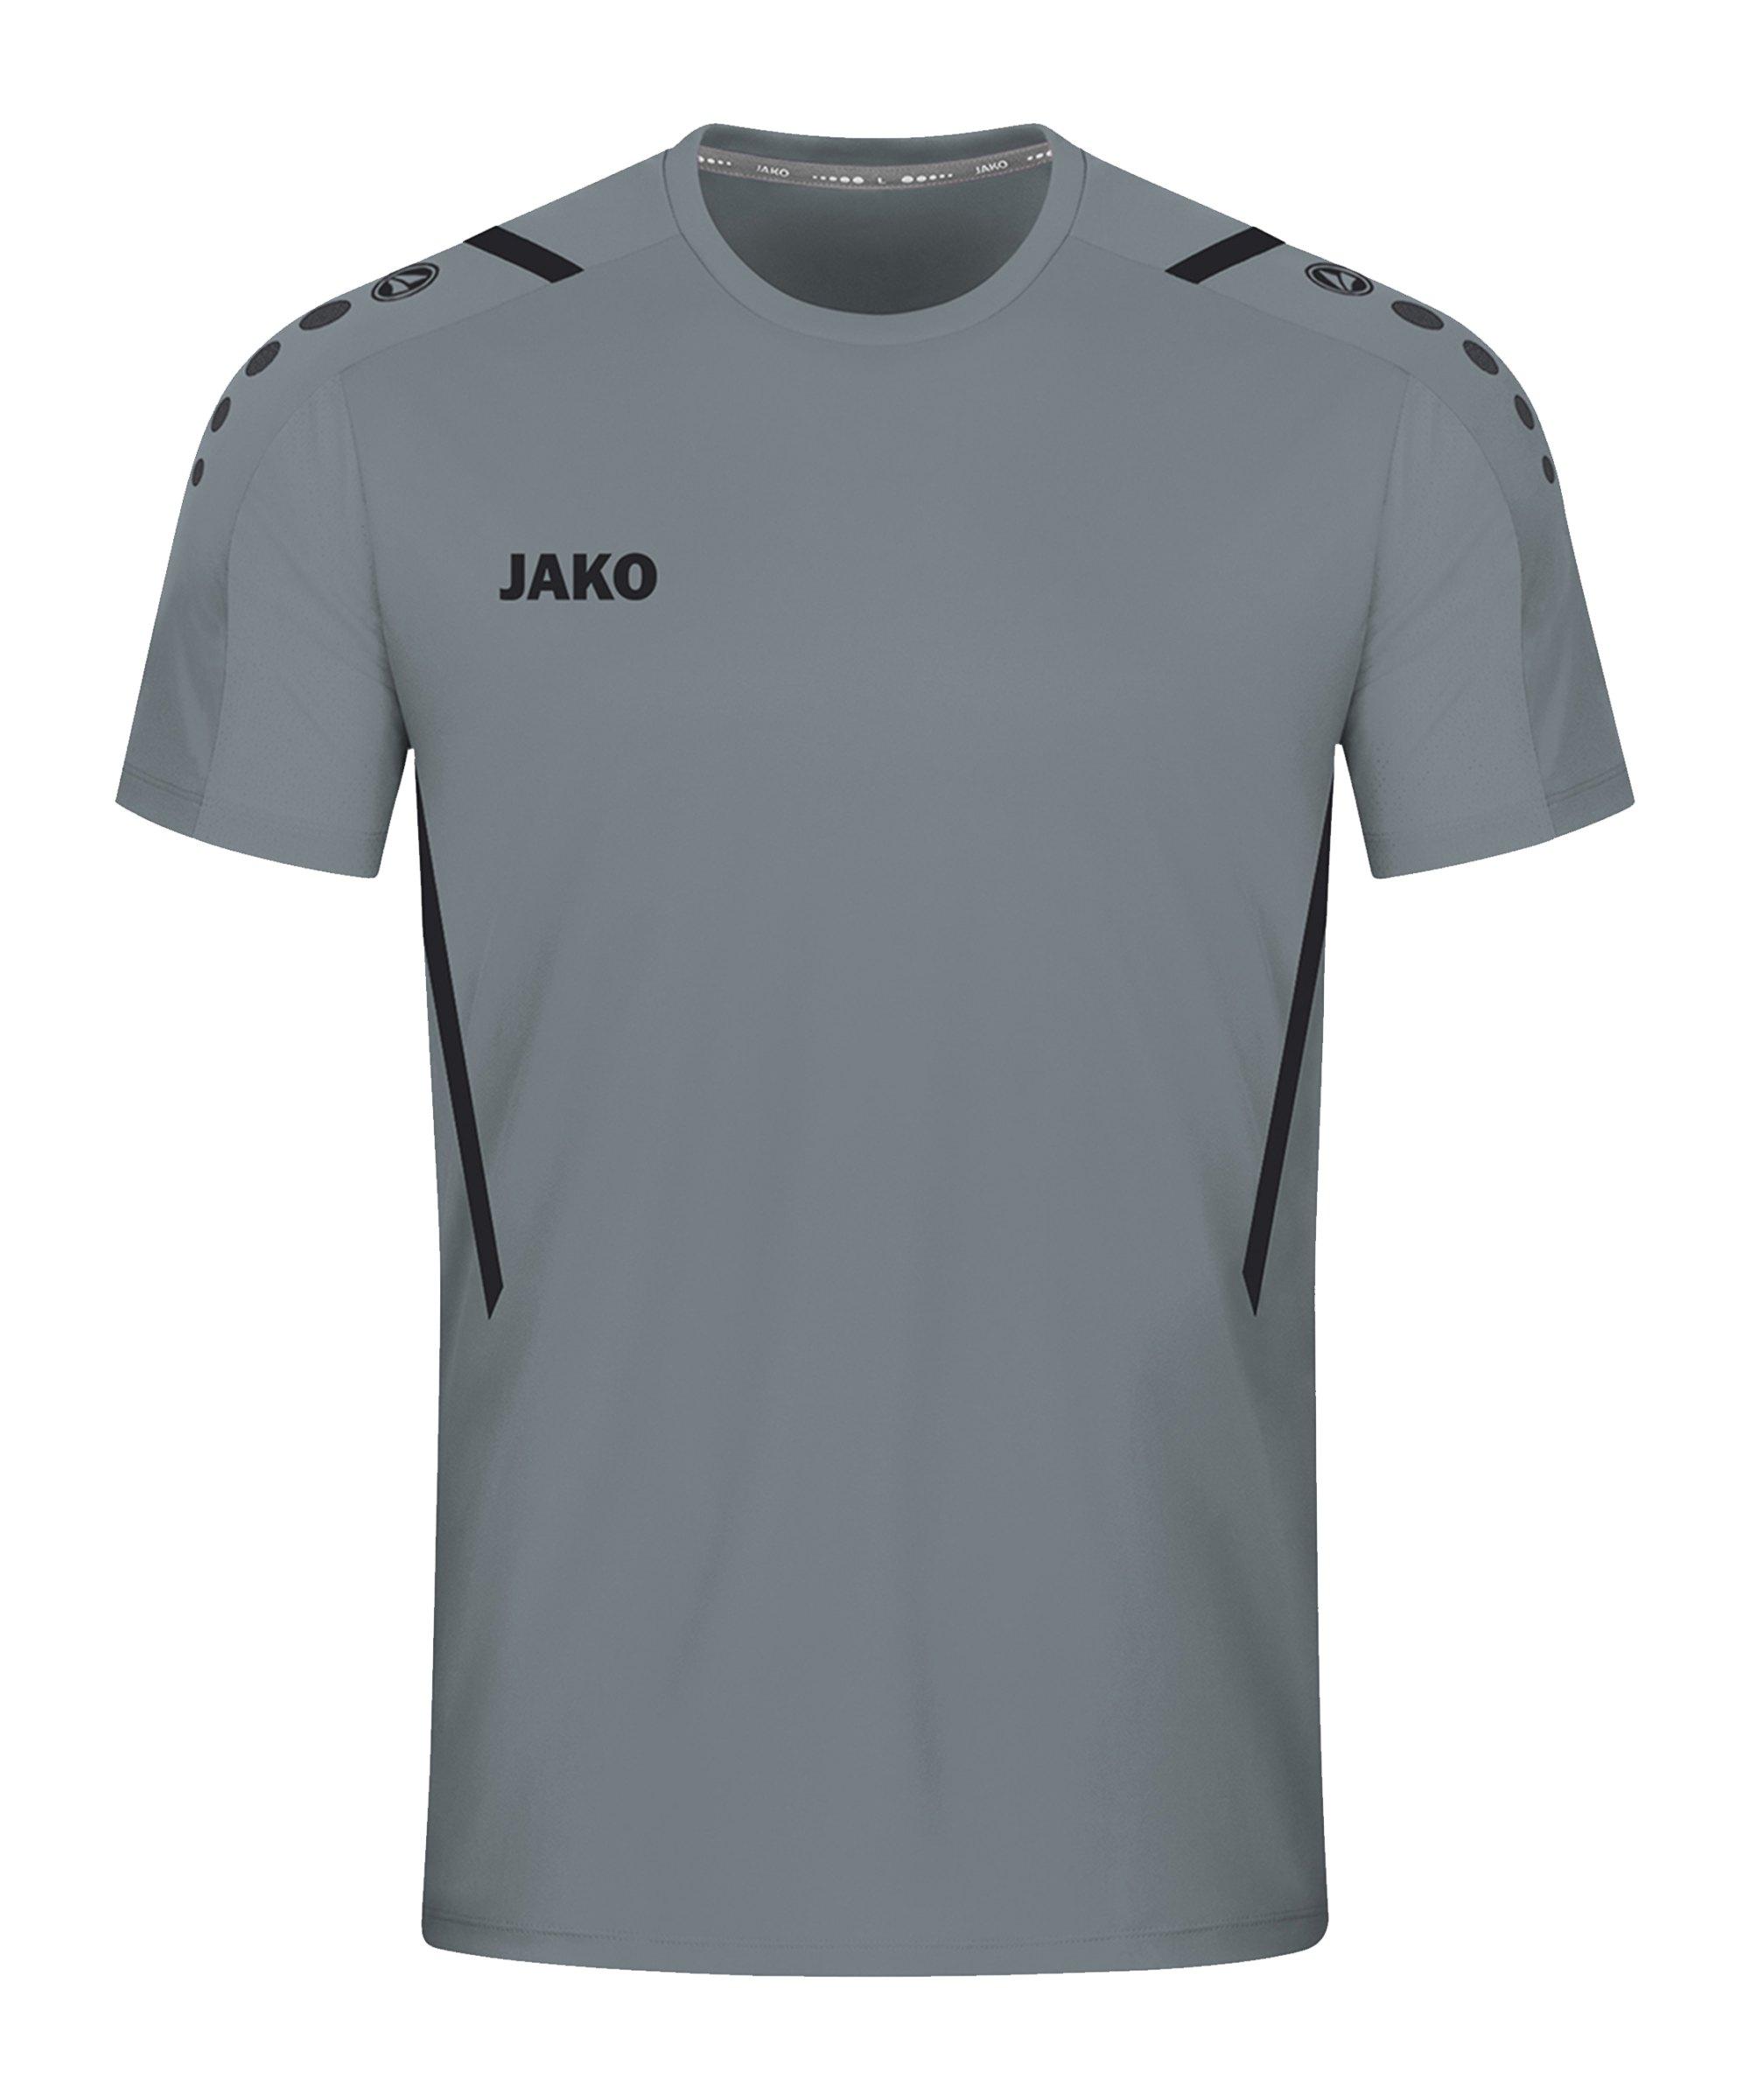 JAKO Challenge Trikot Grau Schwarz F841 - grau